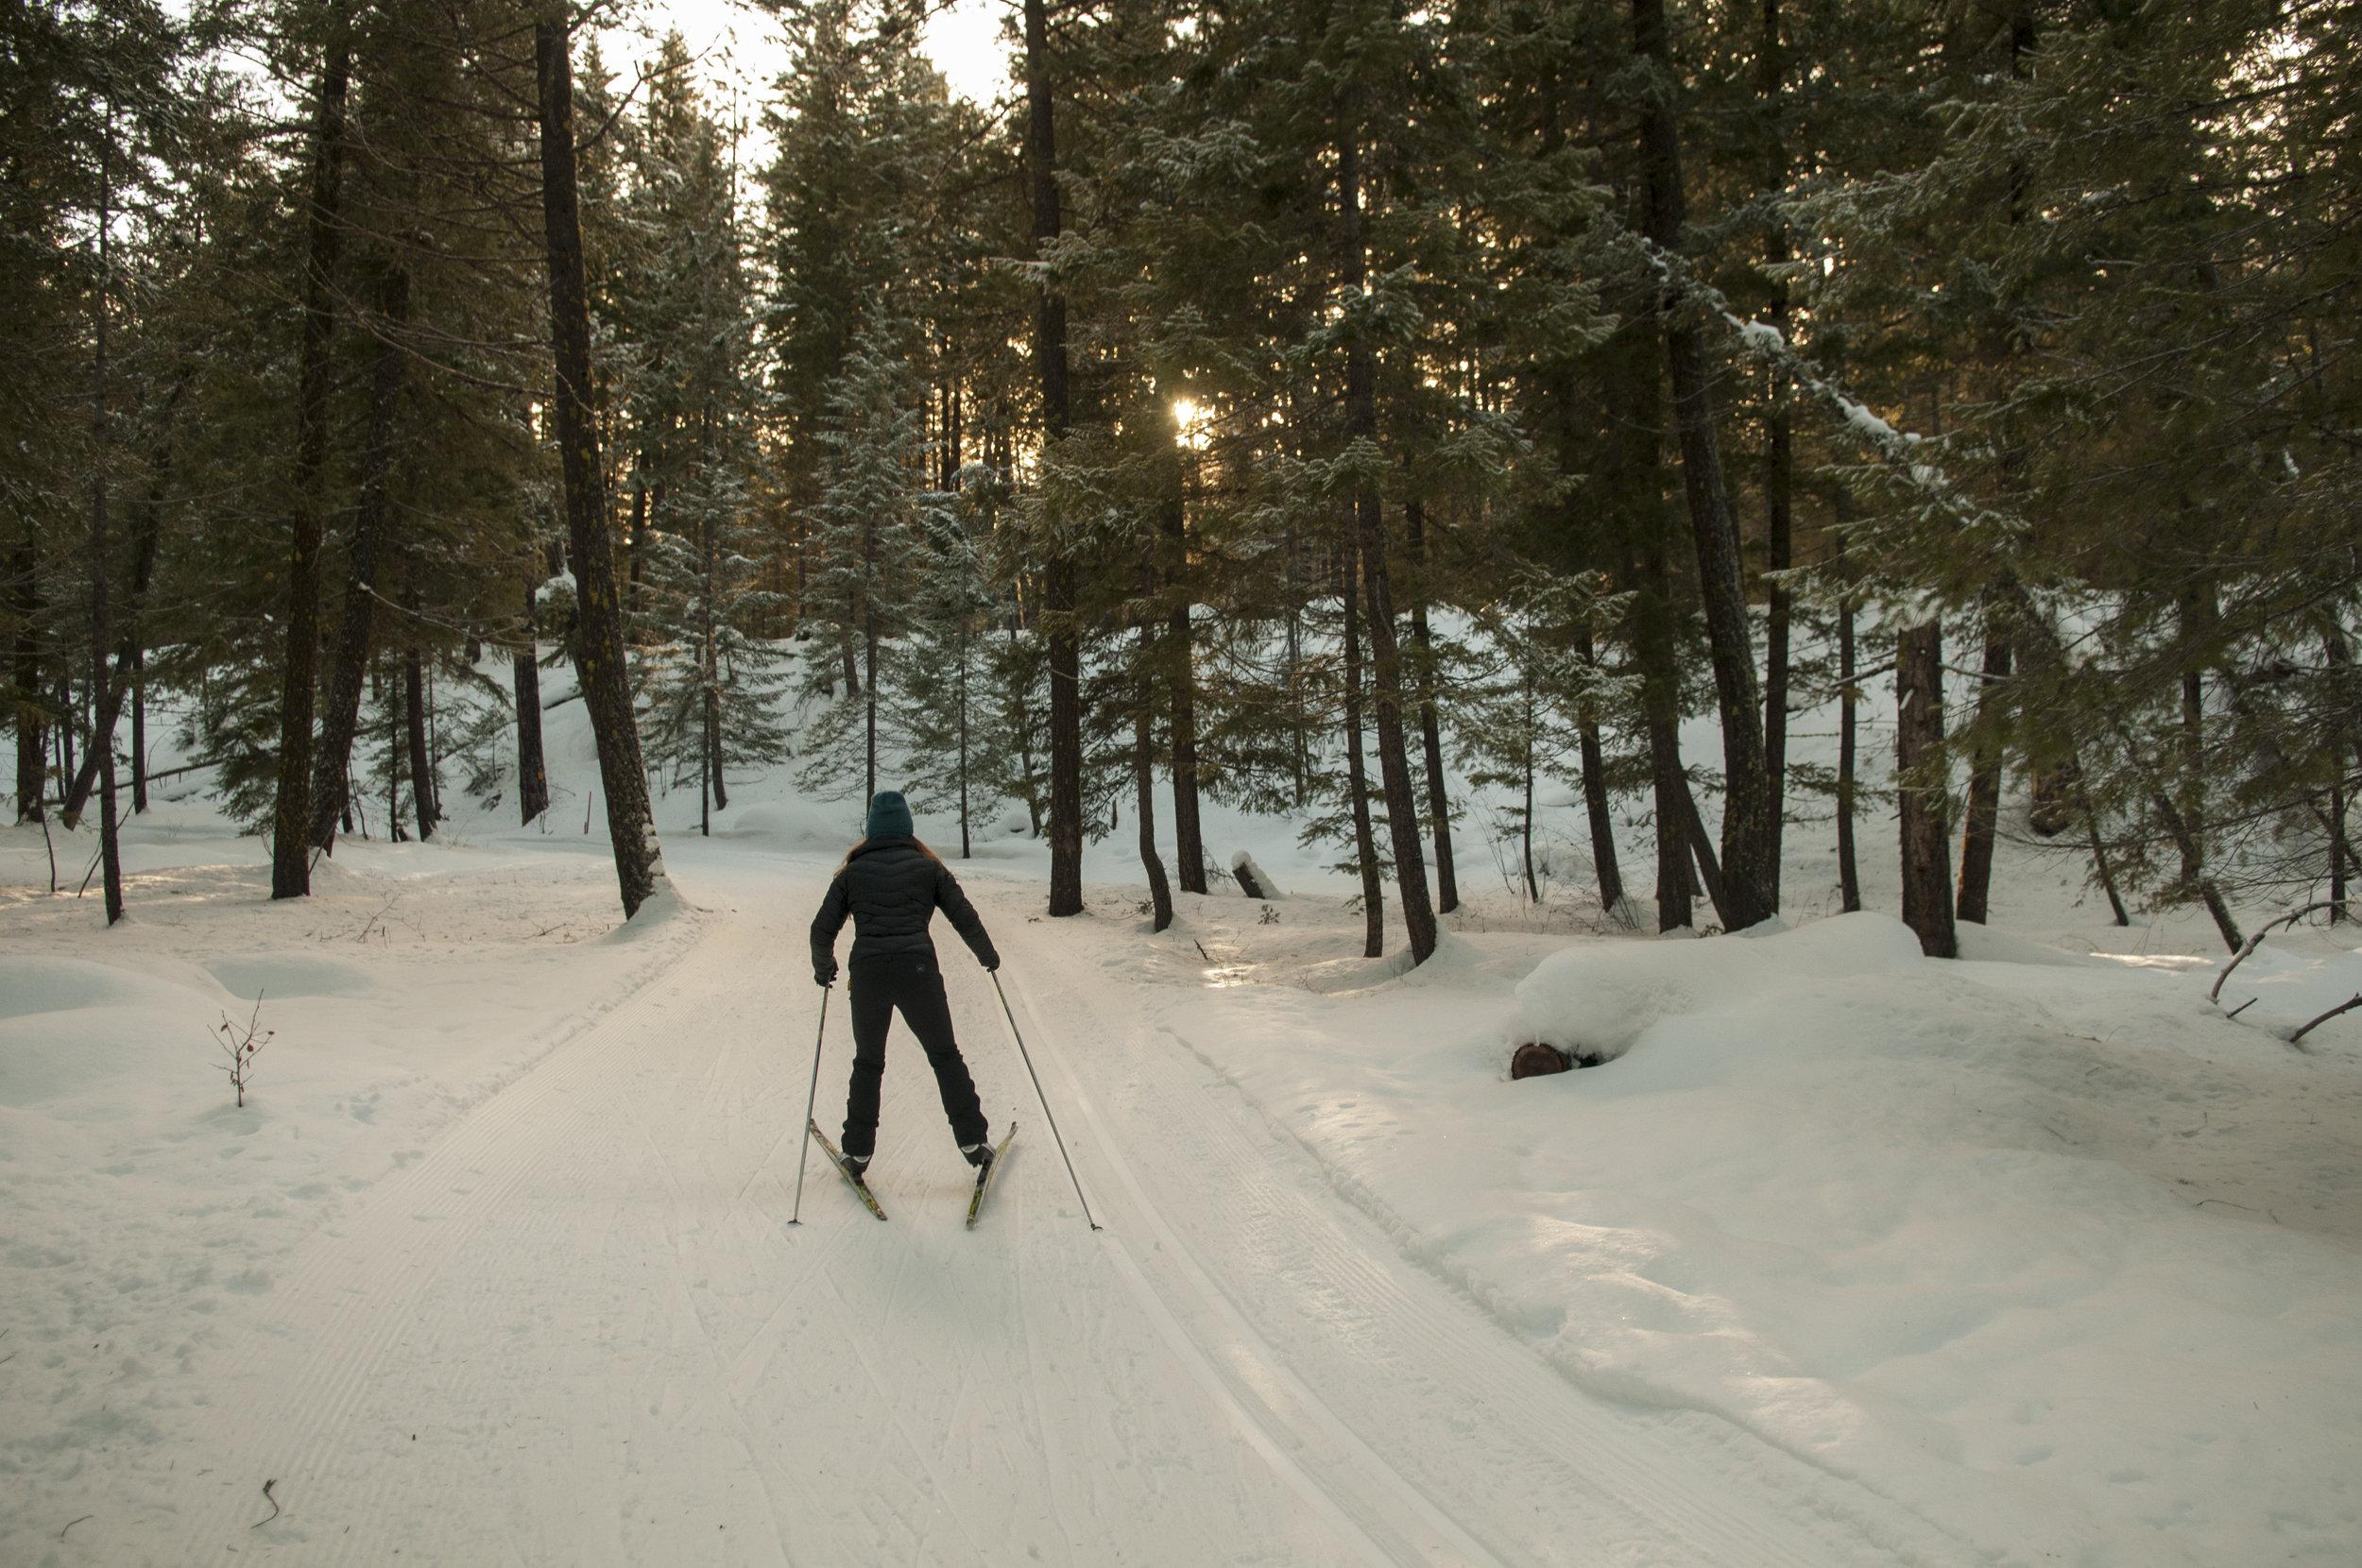 On our way back to the trailhead on the last day of skiing. Photo © Nikolaj Lasbo / TNC